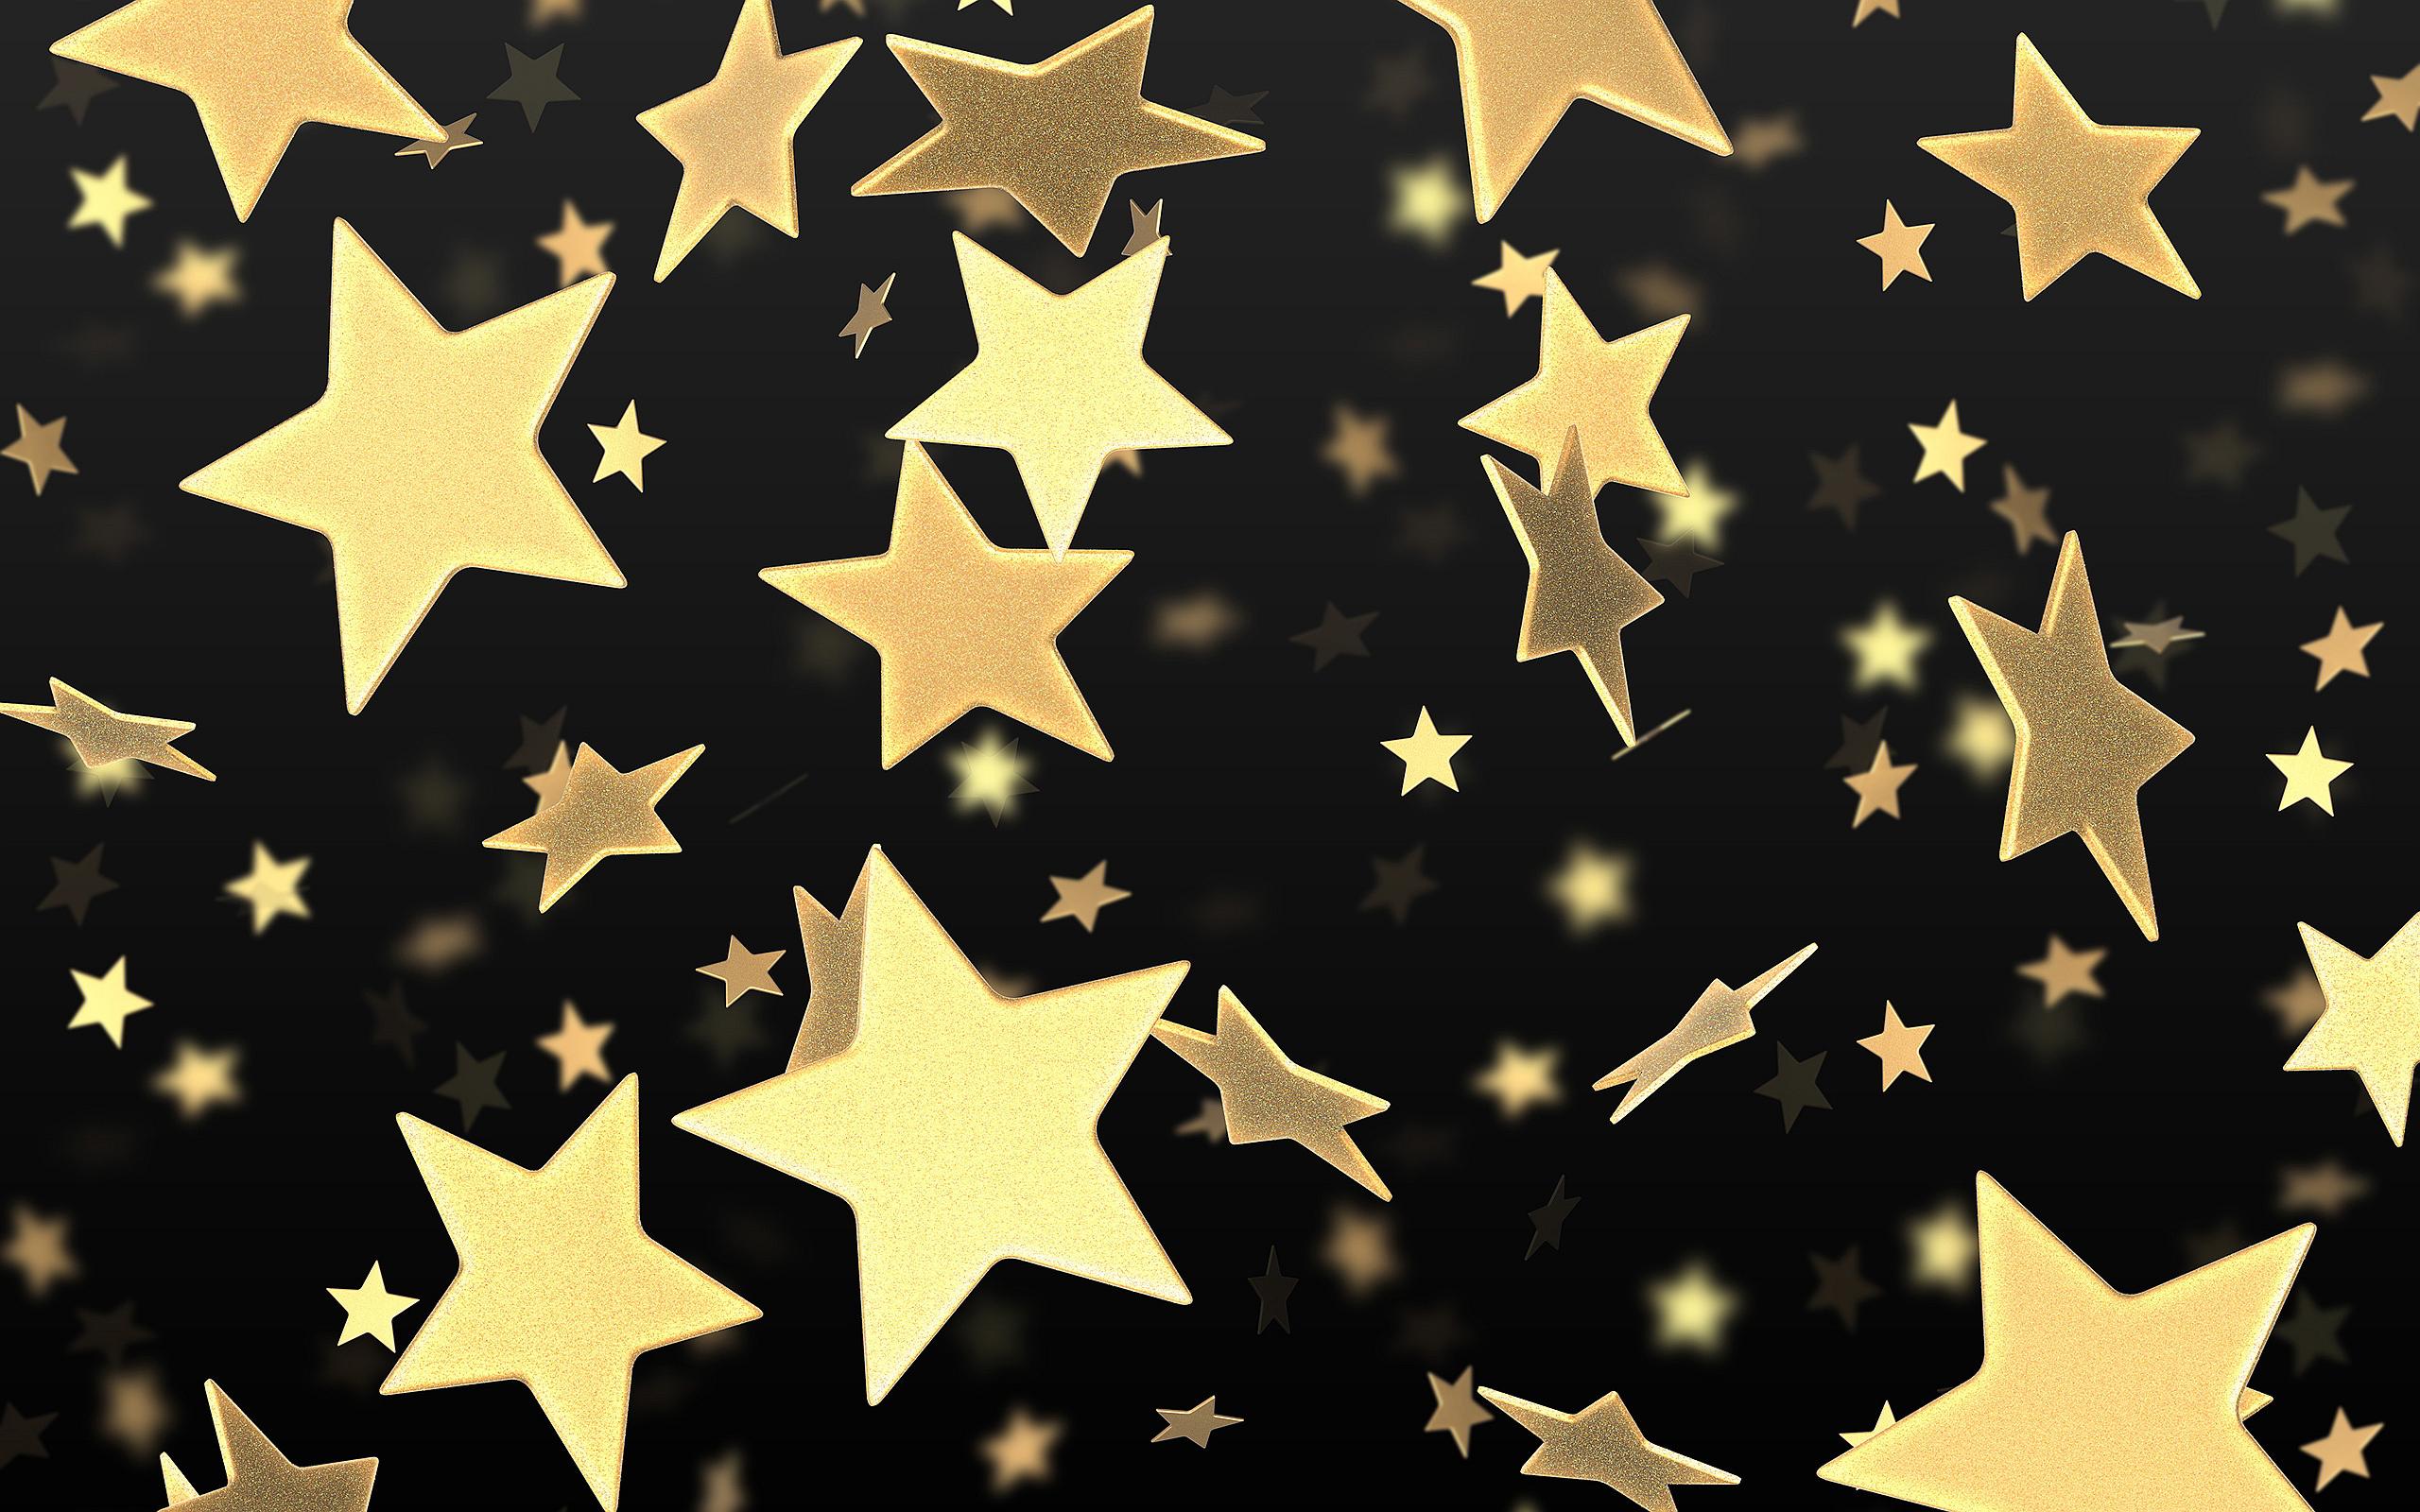 desktop wallpaper tumblr,pattern,design,star,metal